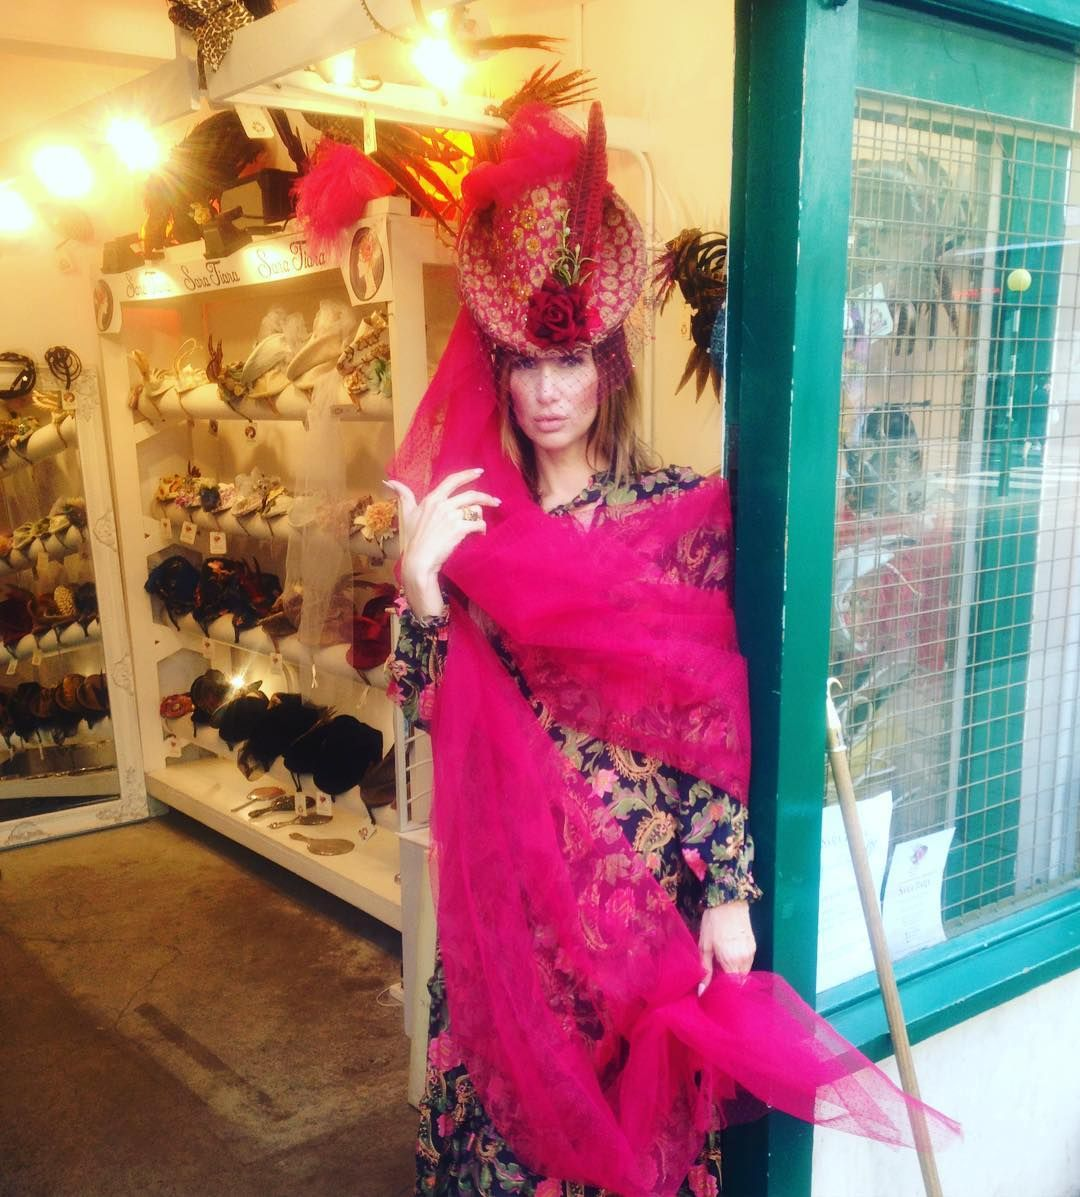 #SaraTiara #SaraTiaraShop #PortobelloMarket #SaraTiaraCustomer #customer #CustomerPhoto #PortobelloRoad #PortobelloRoadShop #SaraTiaraHeadwear #SaraTiaraHats #millinery #HatShopping #HatShop #Nottinghill #handmade #HandmadeHat #OneOfAKindDesign #HatWithVeil #PinkVeil #FeathersAndVeilHat #FeathersAndVeil